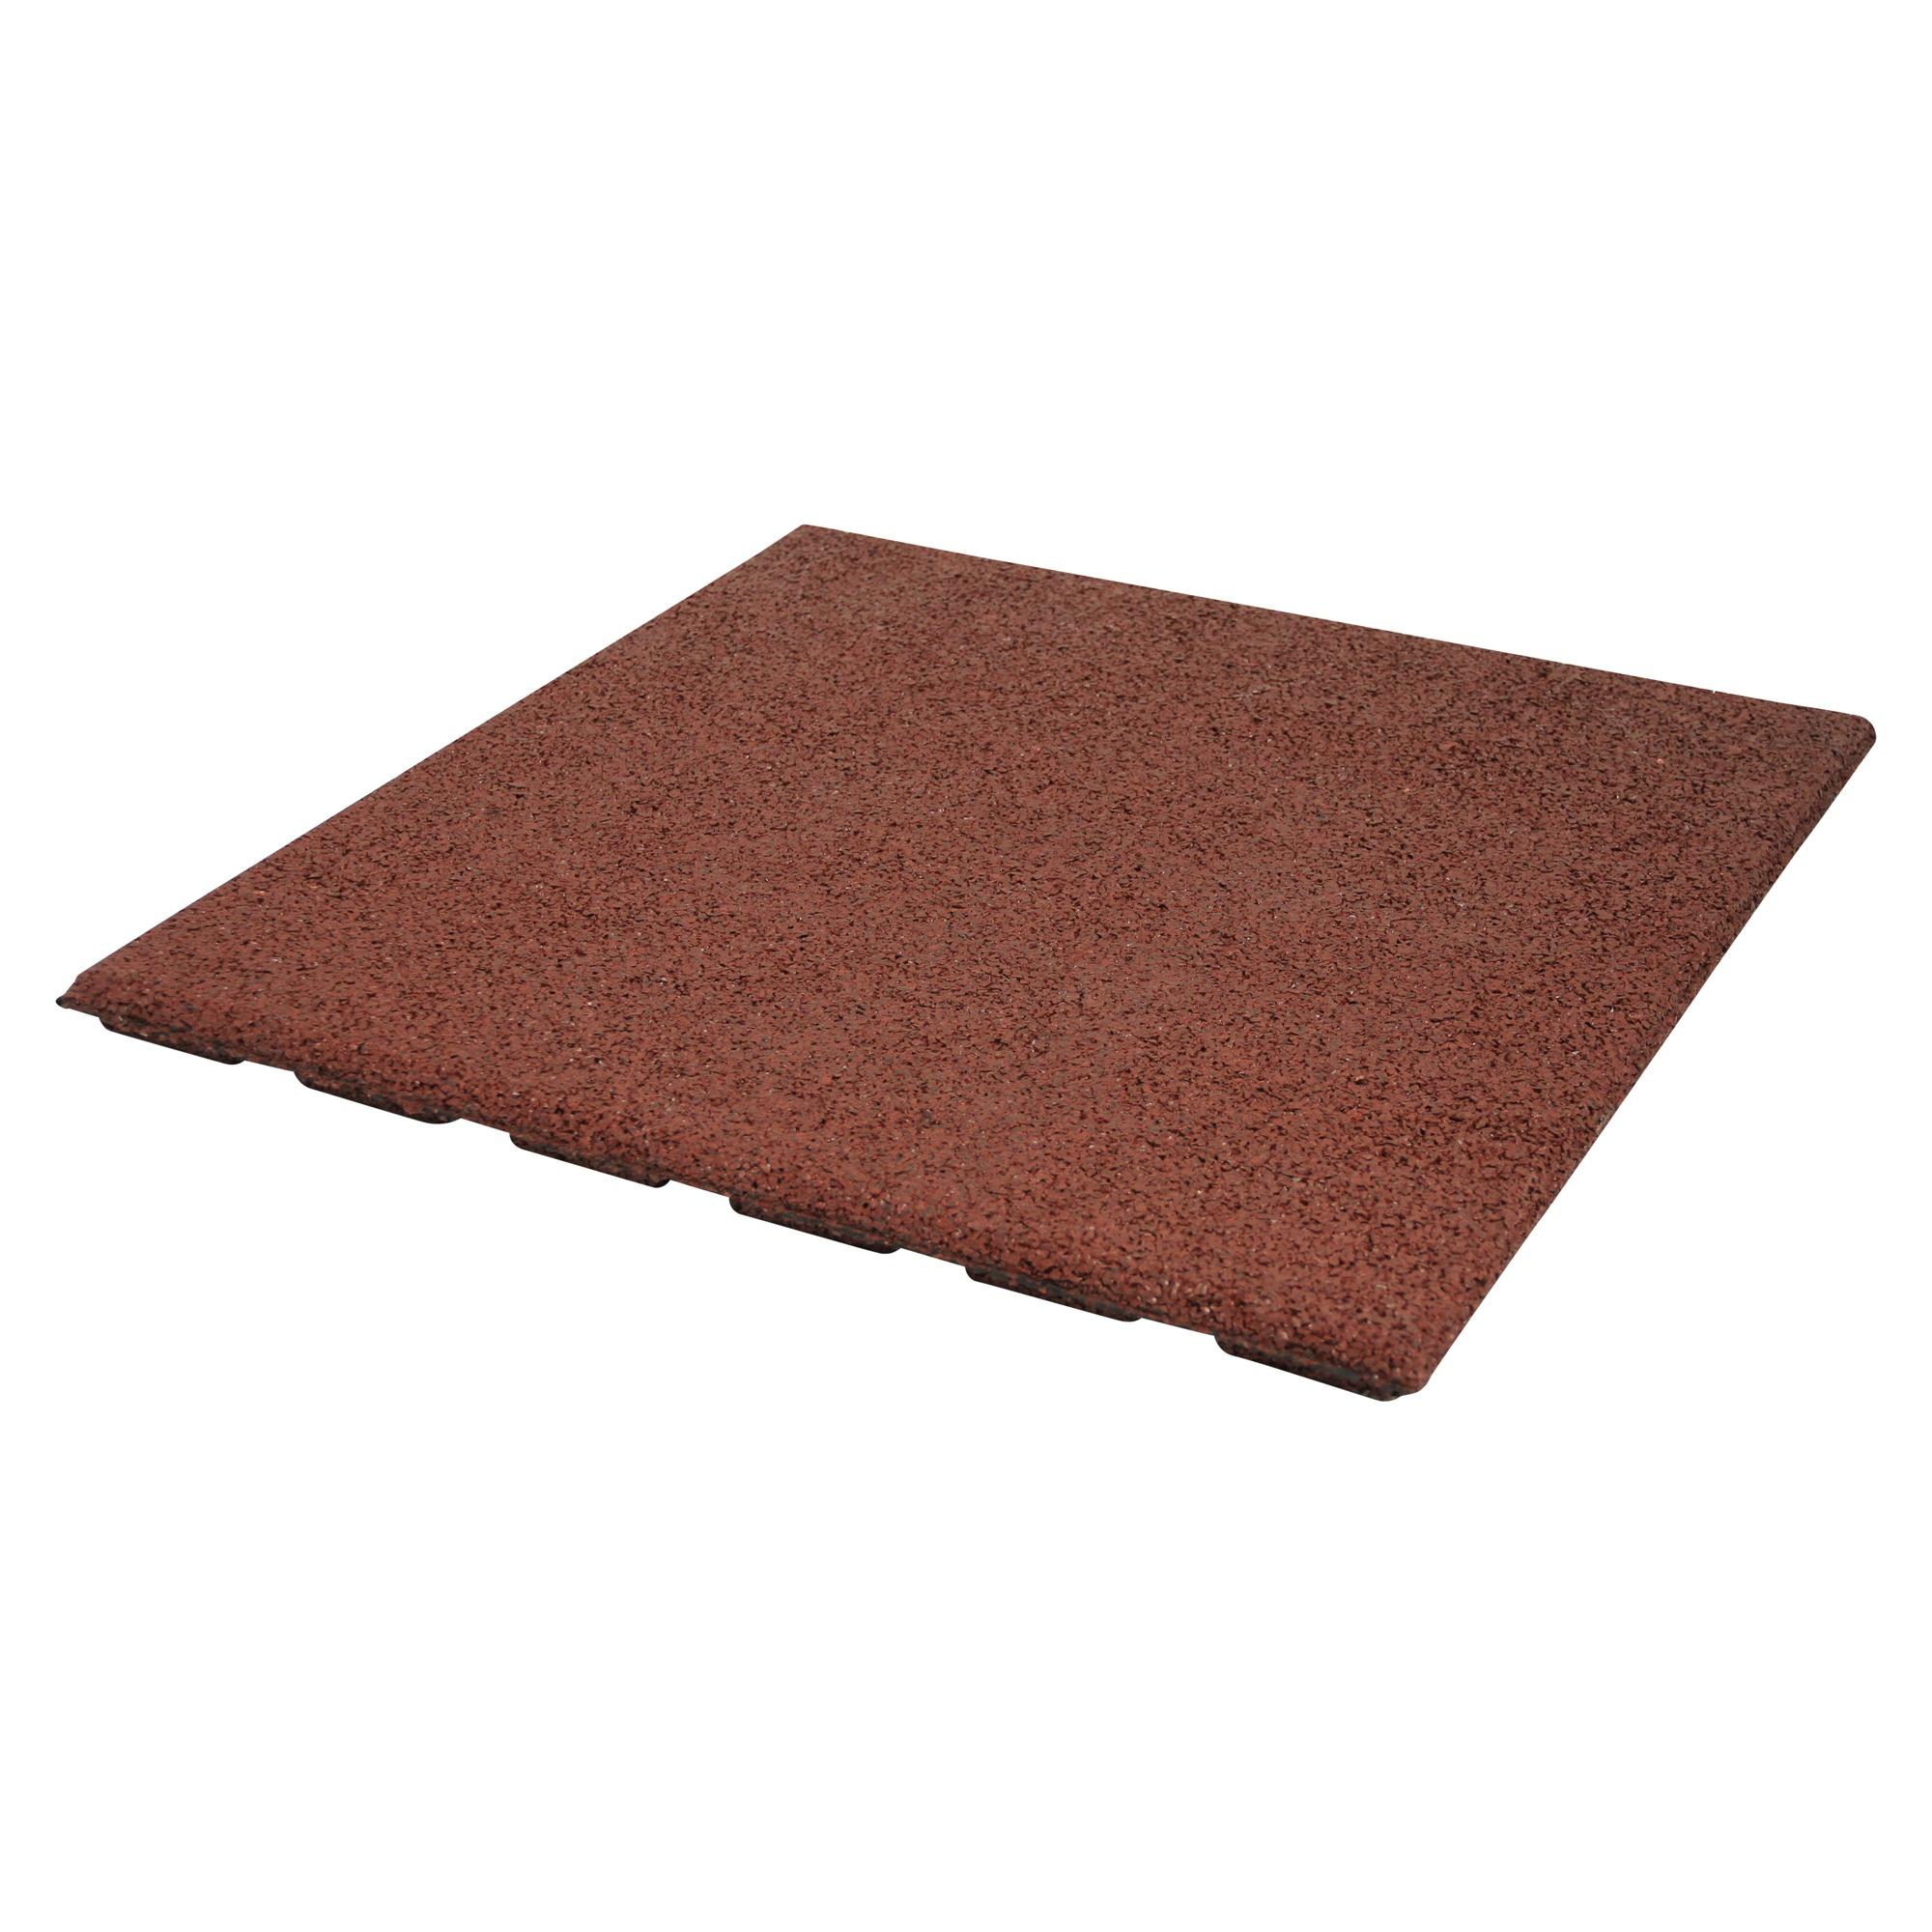 Terrastegel Rubber Rood 50x50 cm - 46 Tegels - 11,50 m2